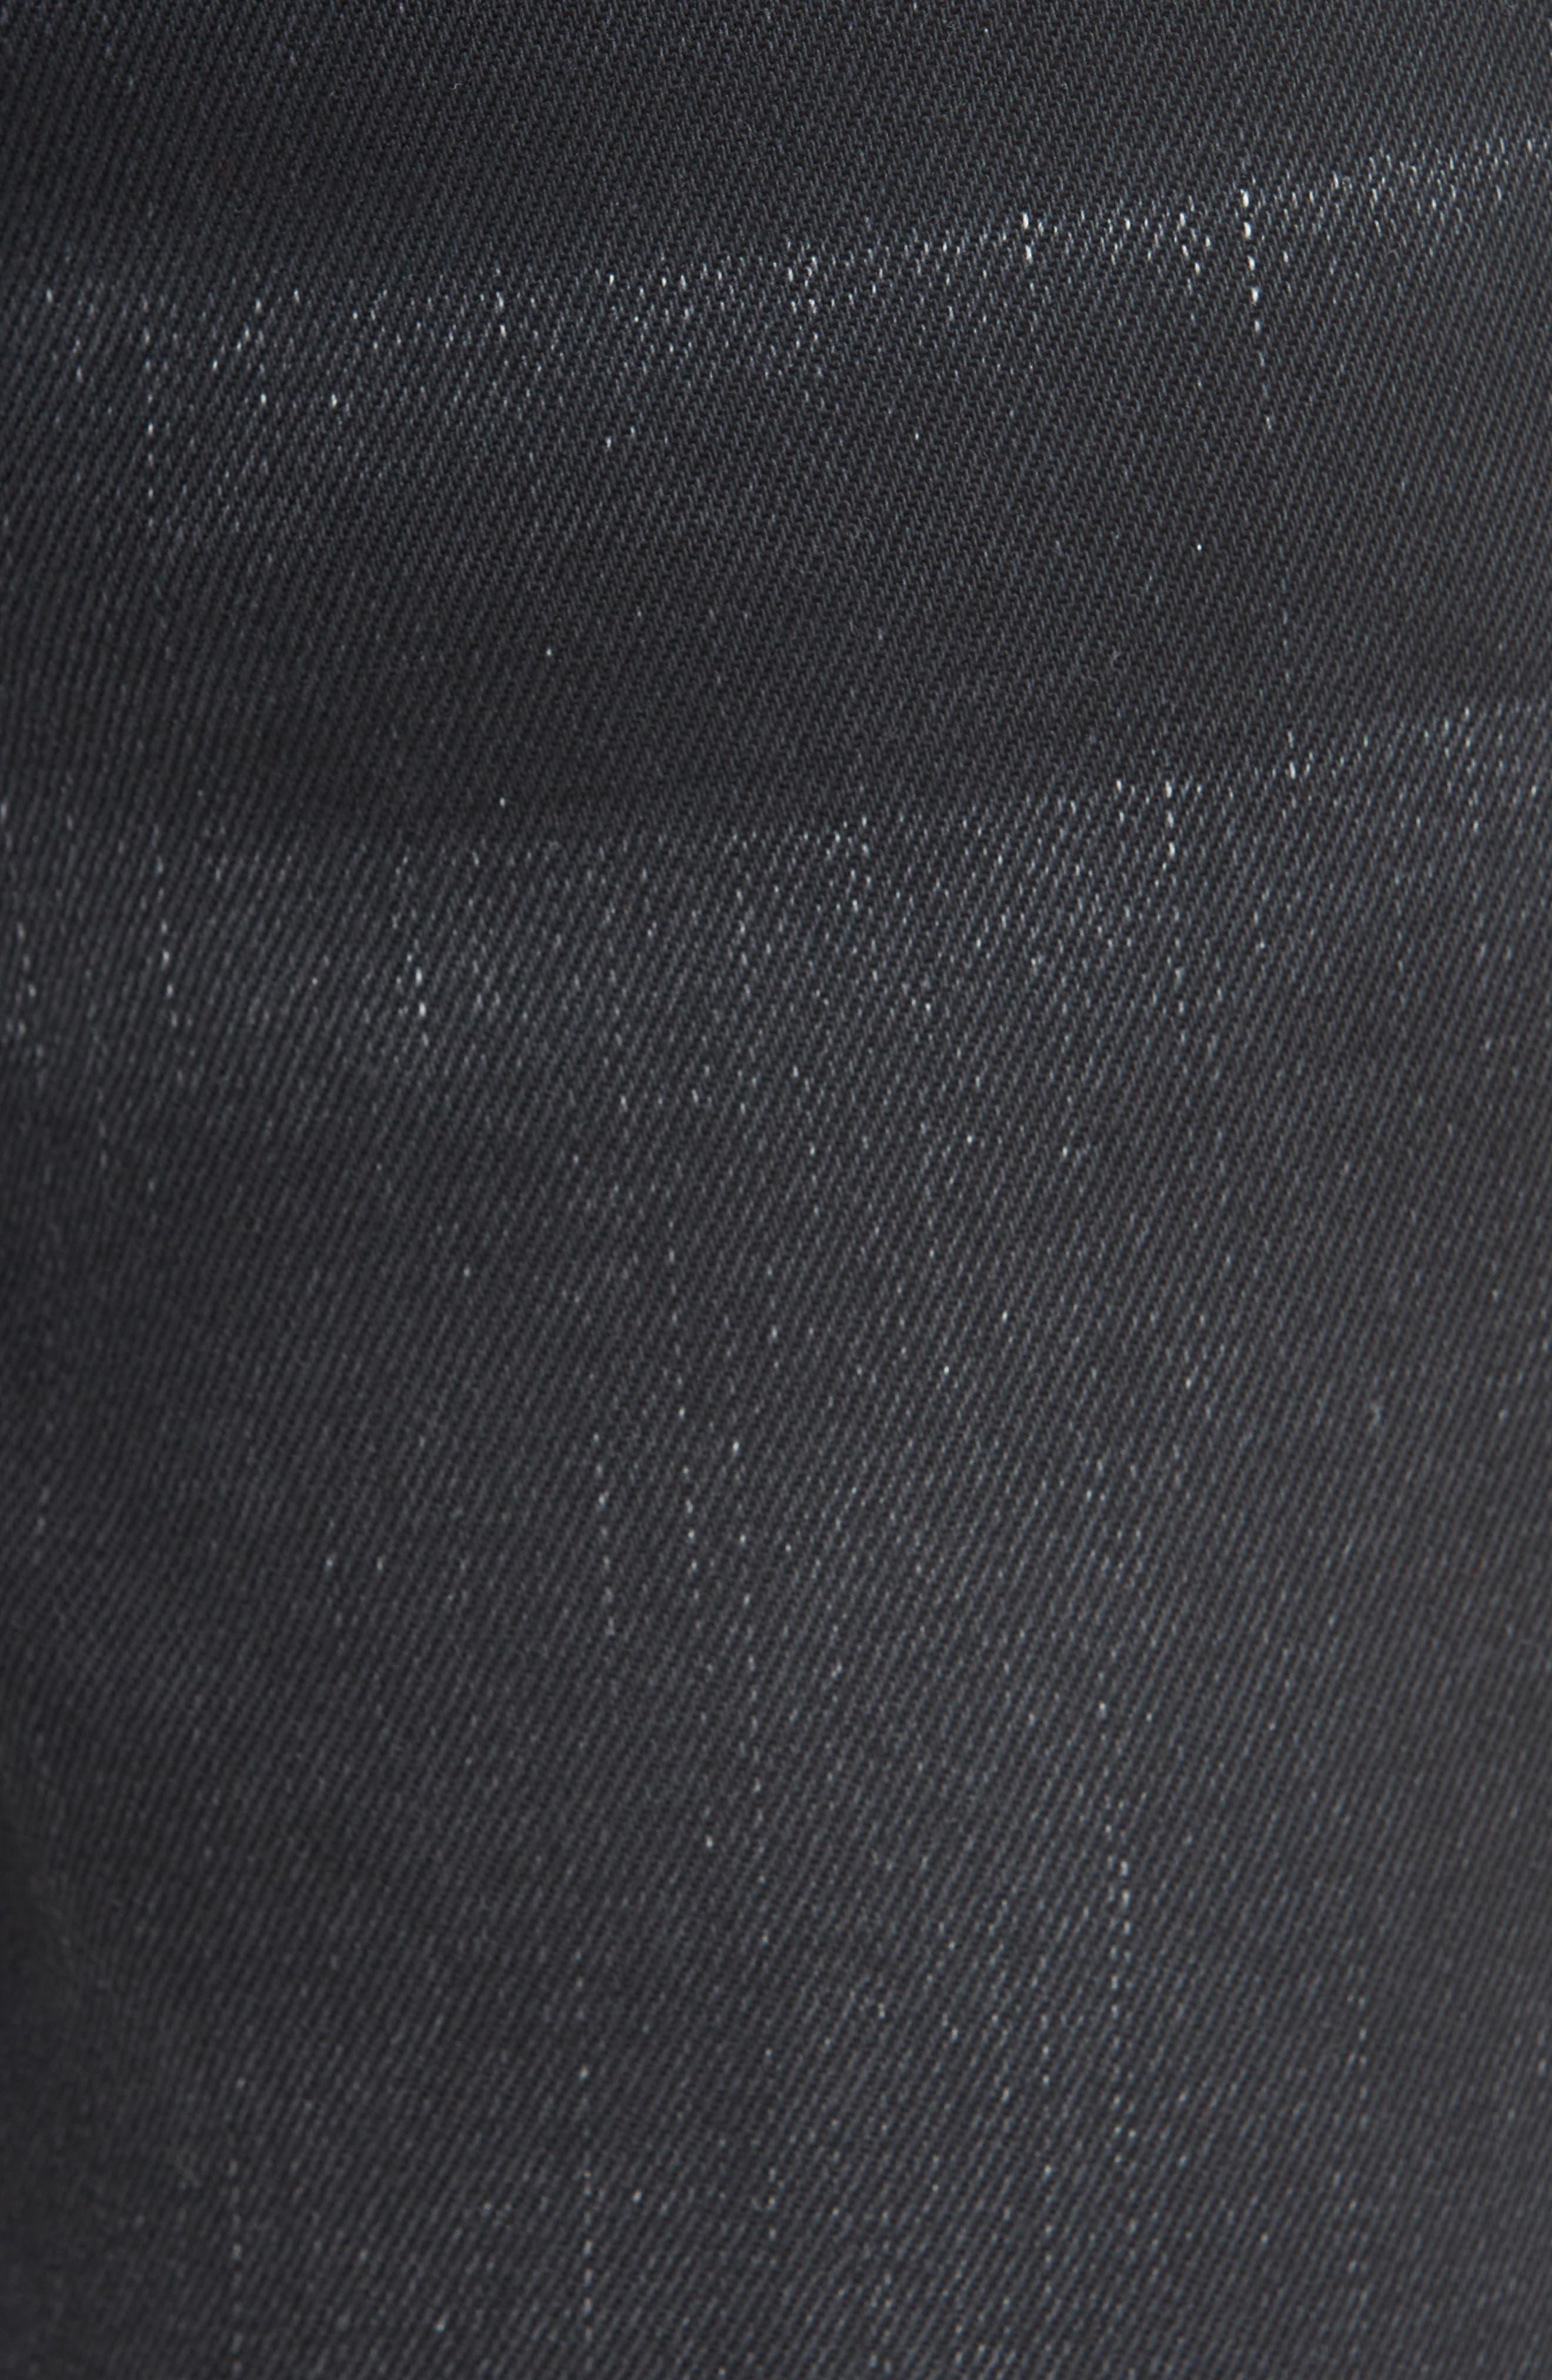 Distressed Slim Fit Jeans,                             Alternate thumbnail 5, color,                             BLACK